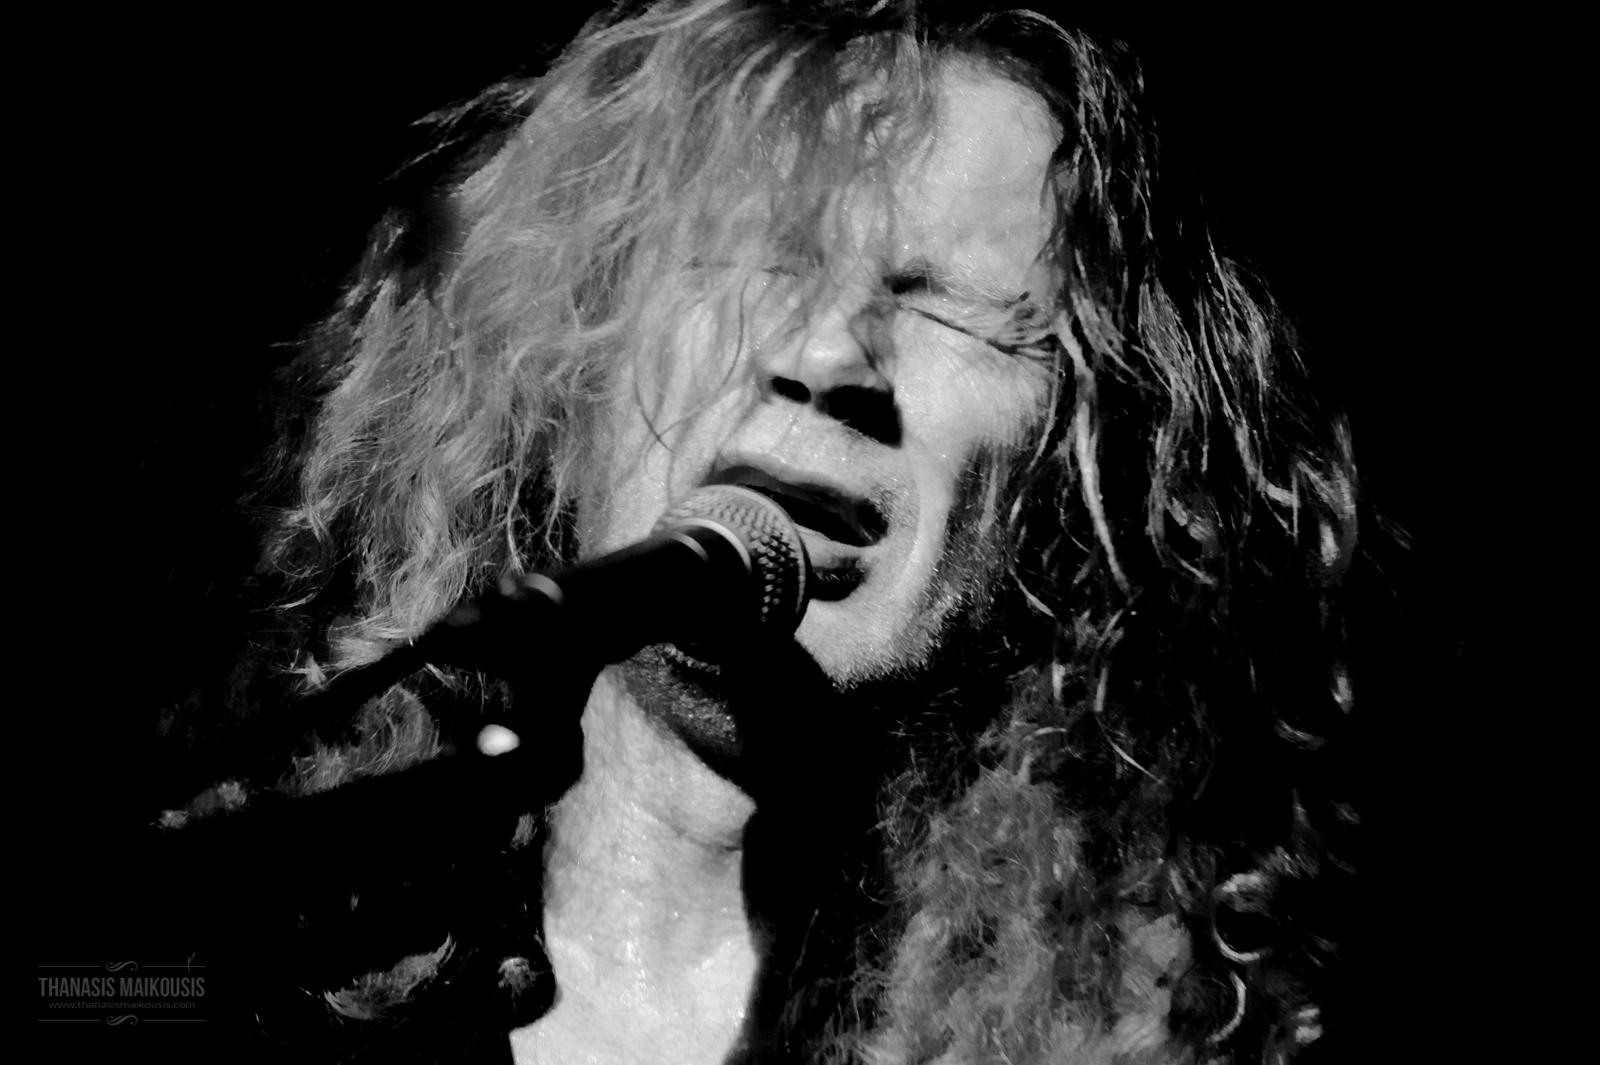 Megadeth live at Piraeus 117 Academy Athens Greece